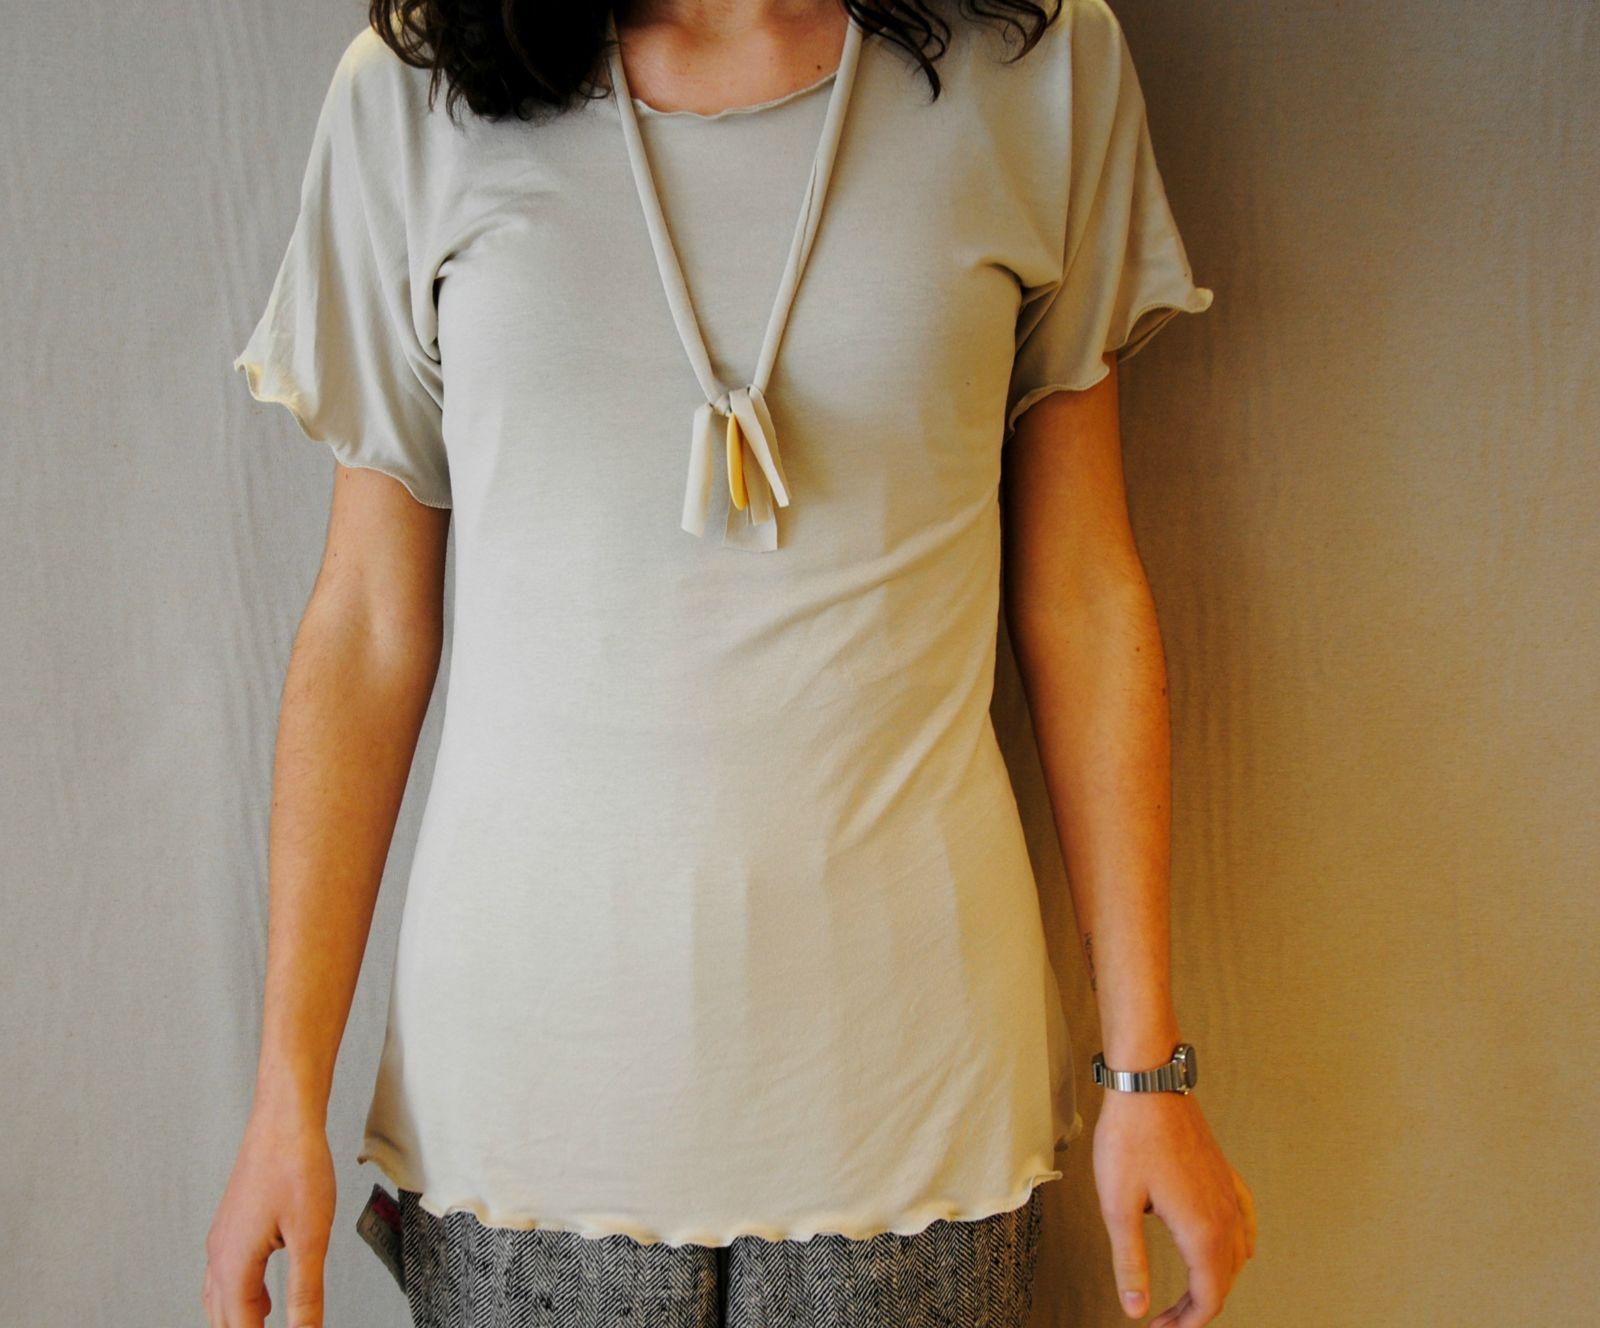 DSC 2286 t shirt MODAL sabbia